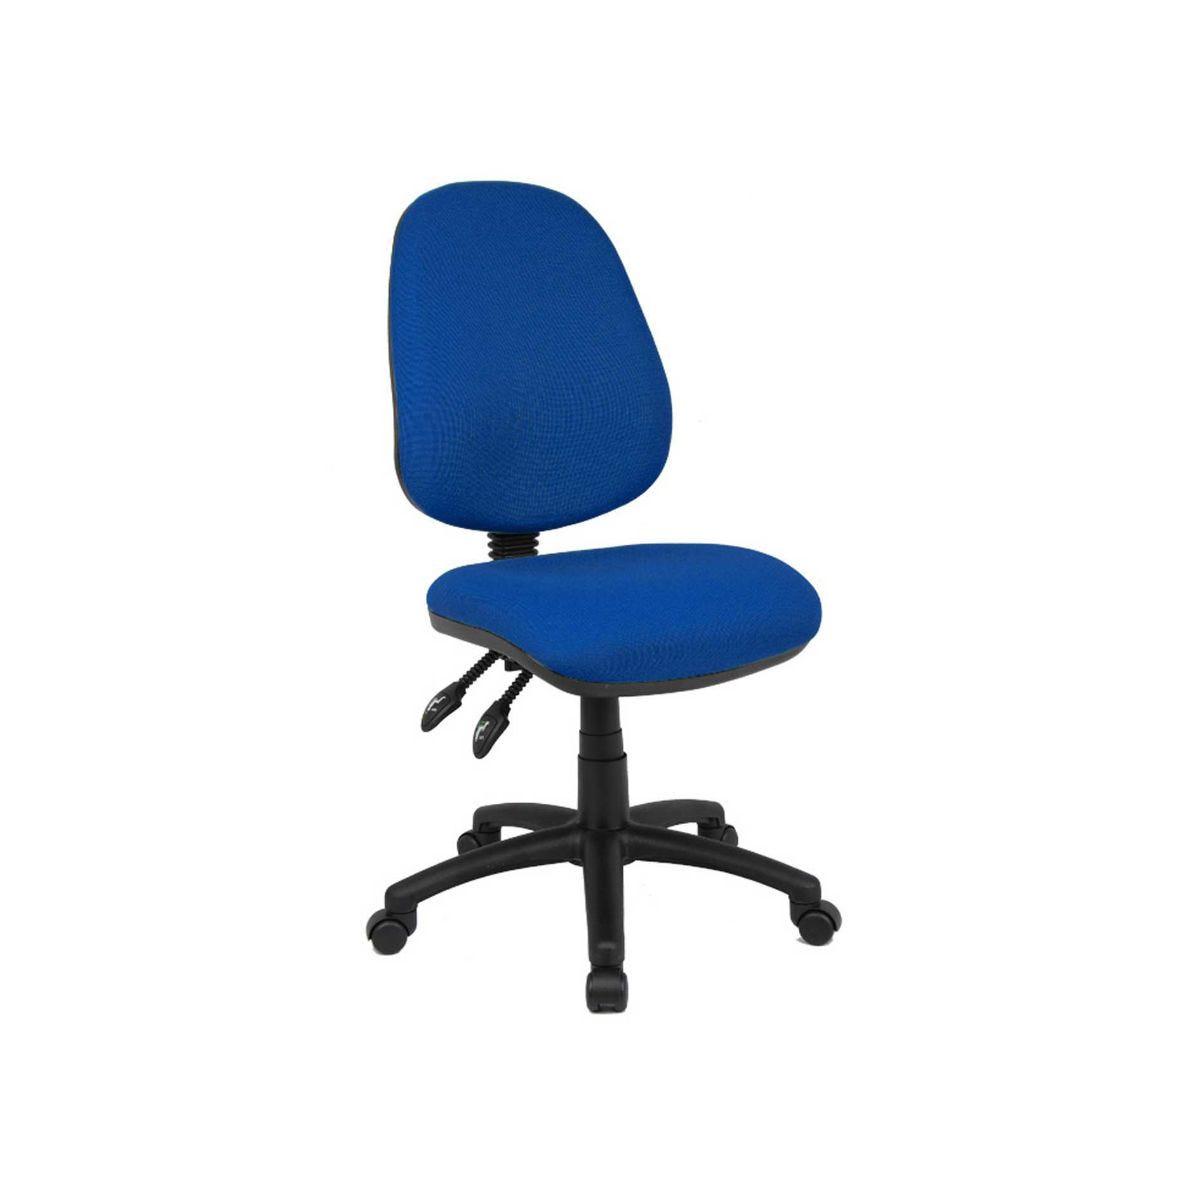 fice Chairs & Seating Furniture & Storage Ryman